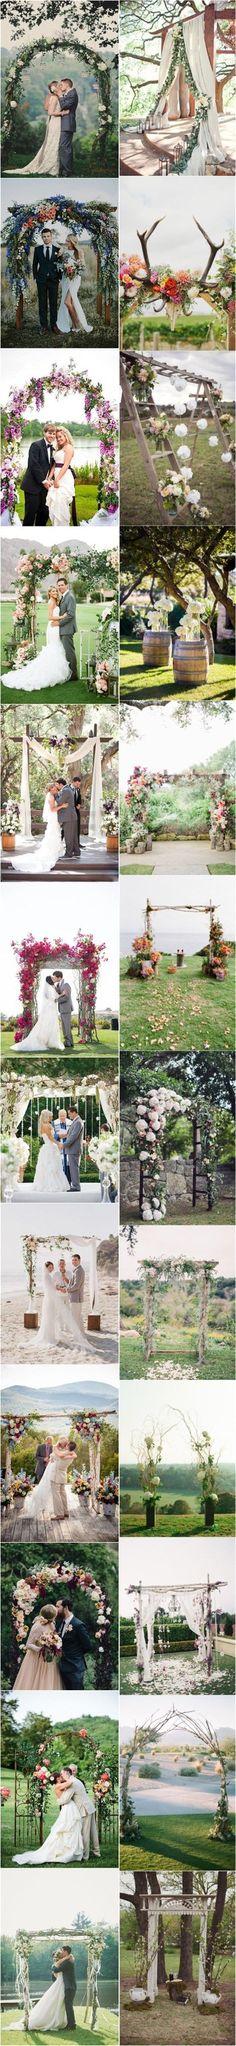 Top 25 Wedding Arch Decoration Ideas- Floral Wedding Arches